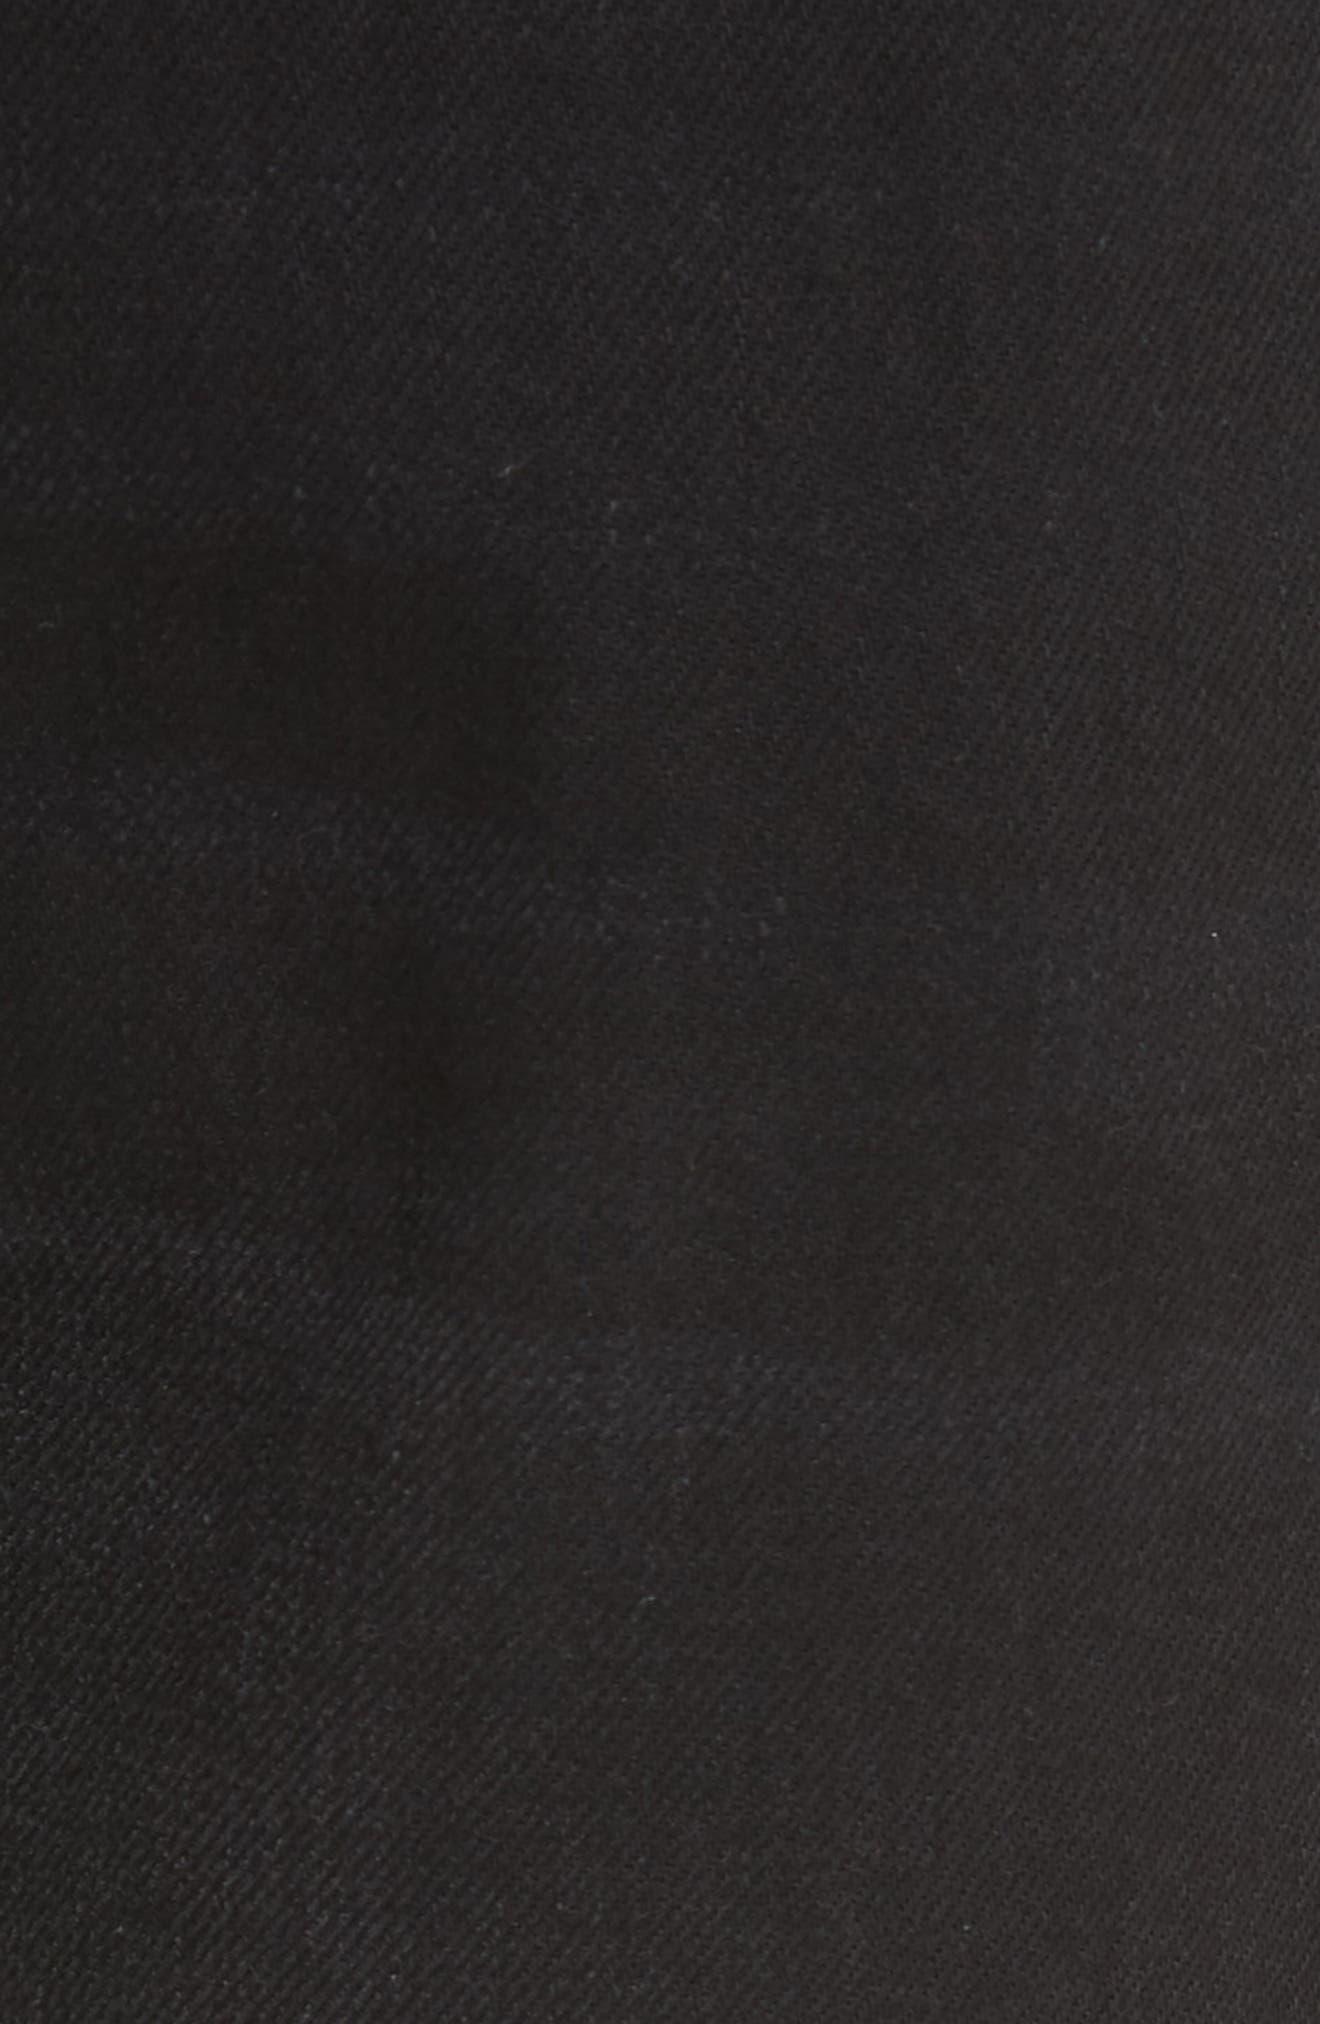 Le Original Released Hem High Waist Jeans,                             Alternate thumbnail 5, color,                             Grey River